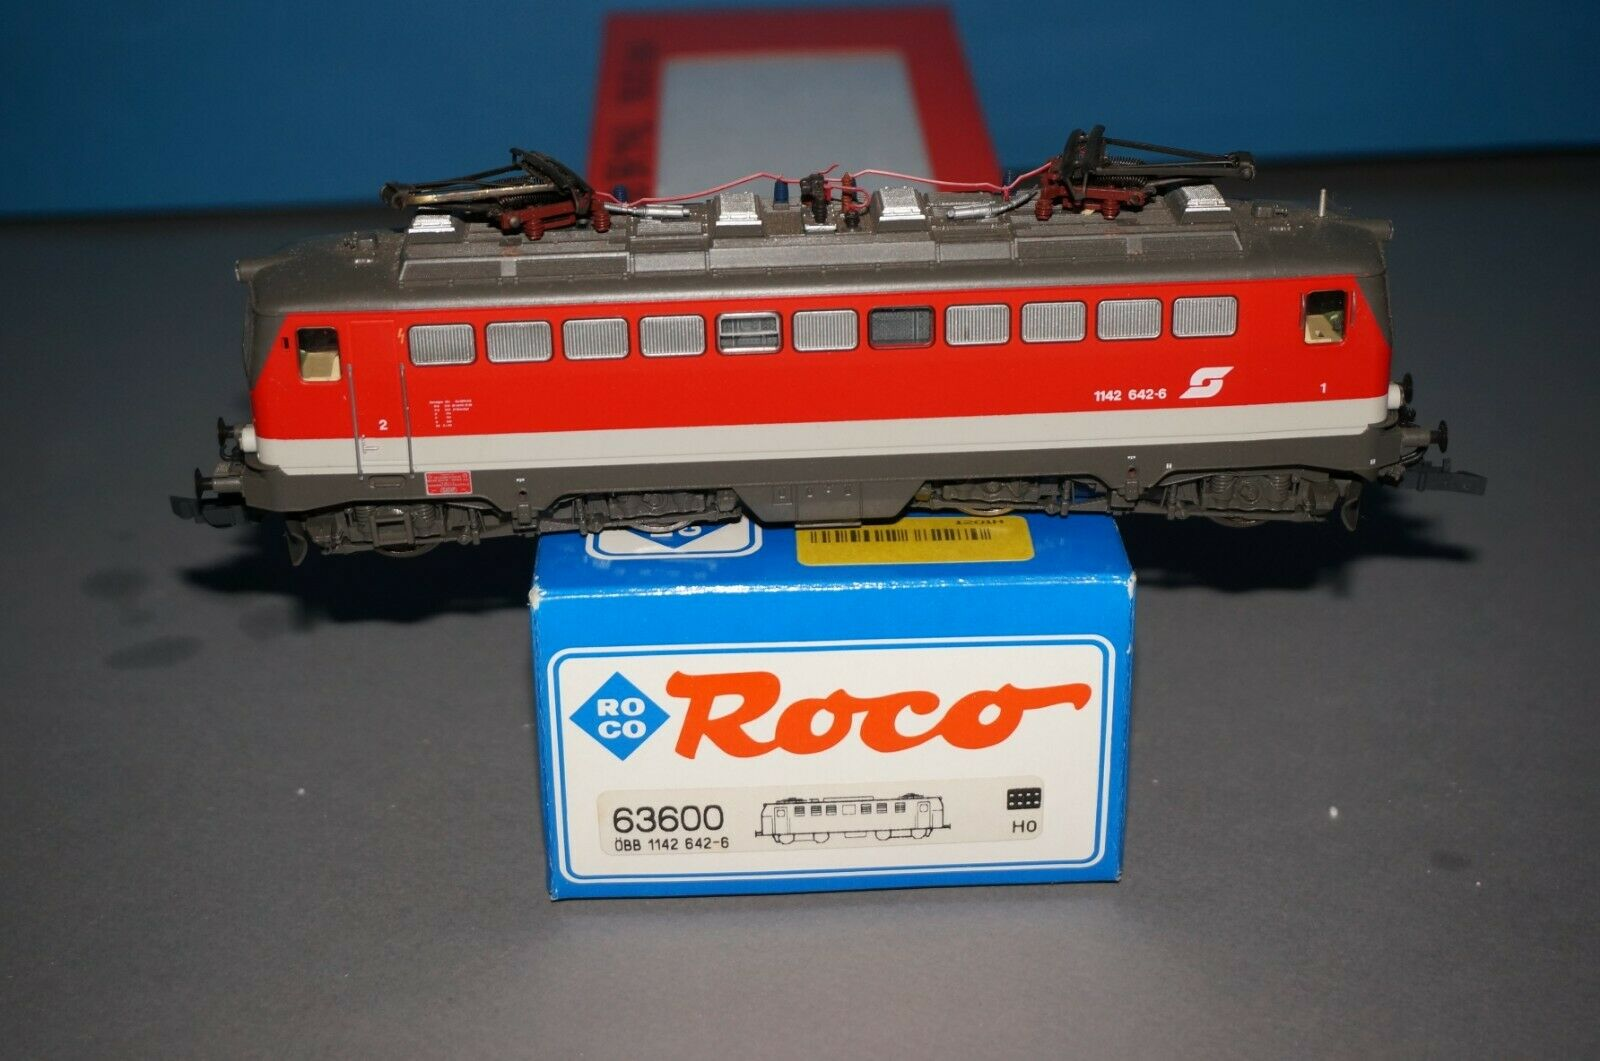 RF-35] ROCO 63600 - H0 - E-Lok - ÖBB 1142 642-6 - AnalogDSS OVP -fährt  | Lebensecht